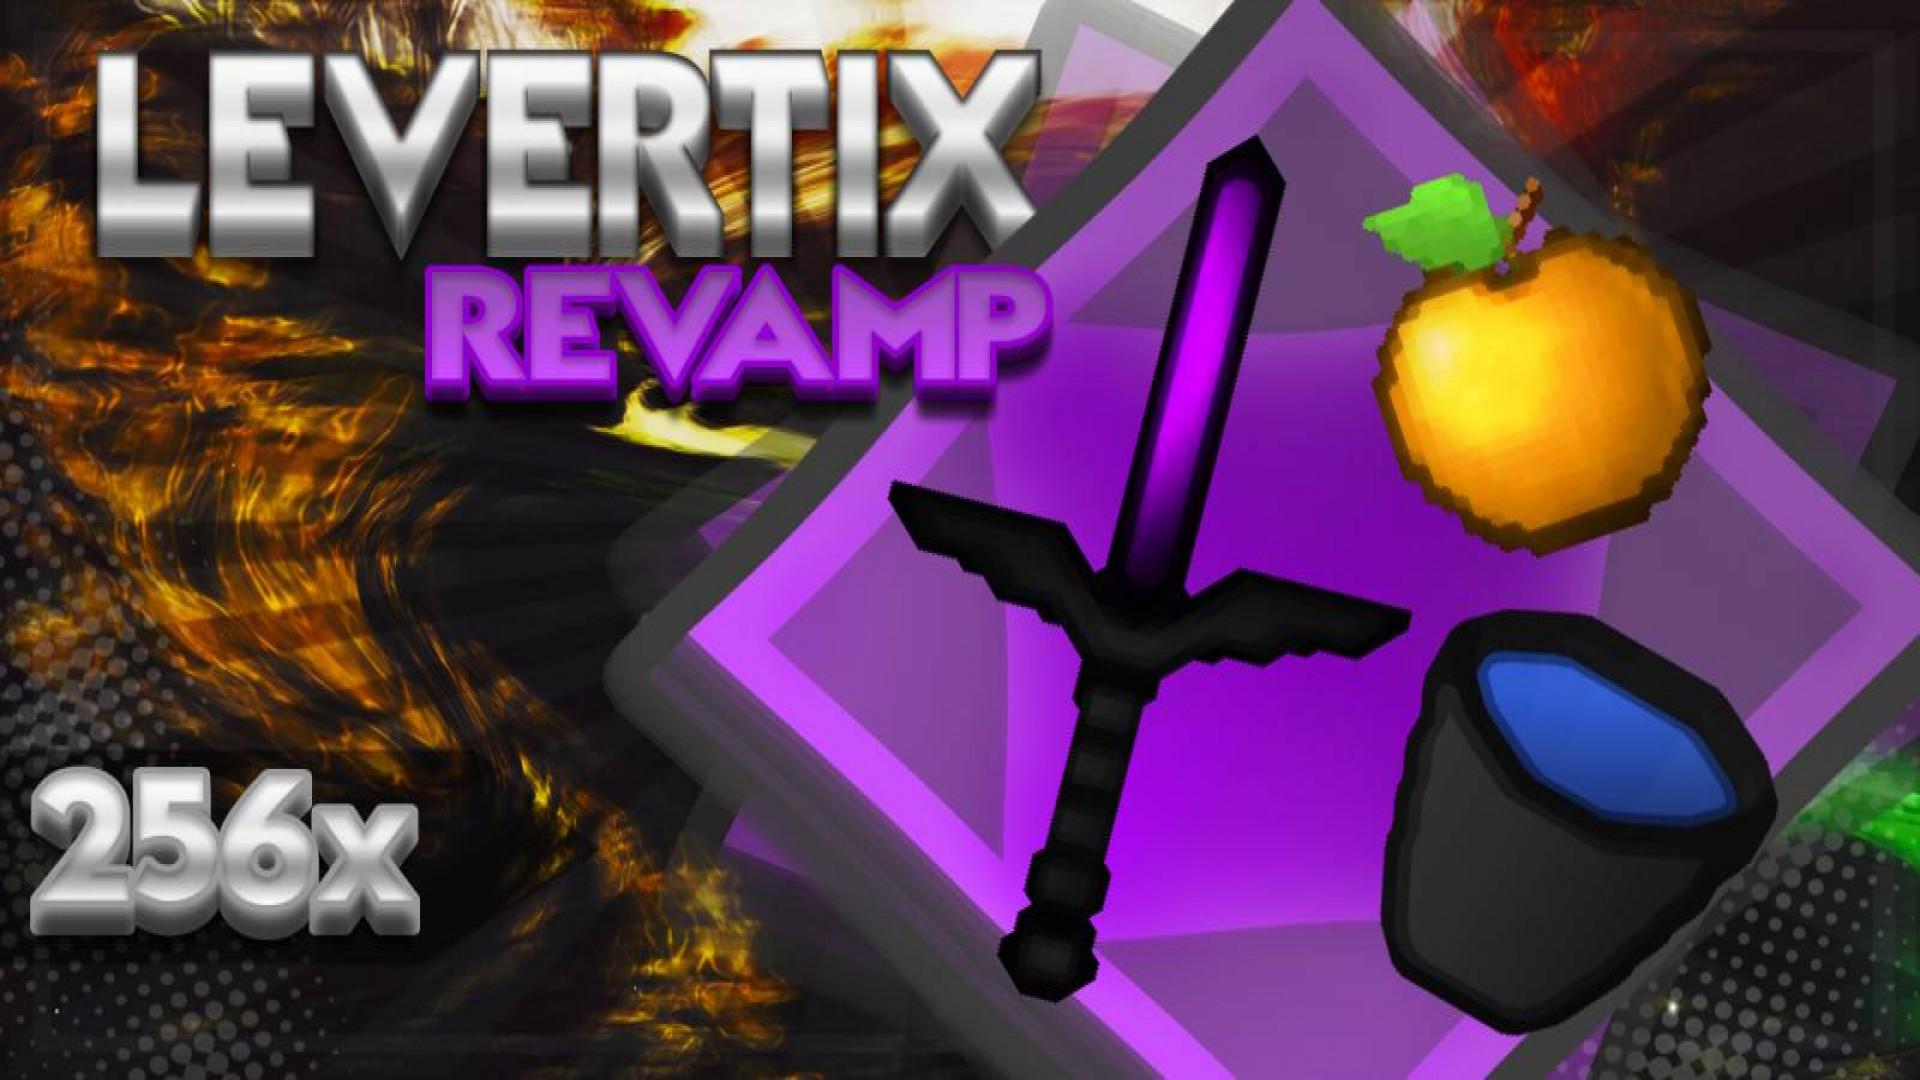 LeVertix [REVAMP]